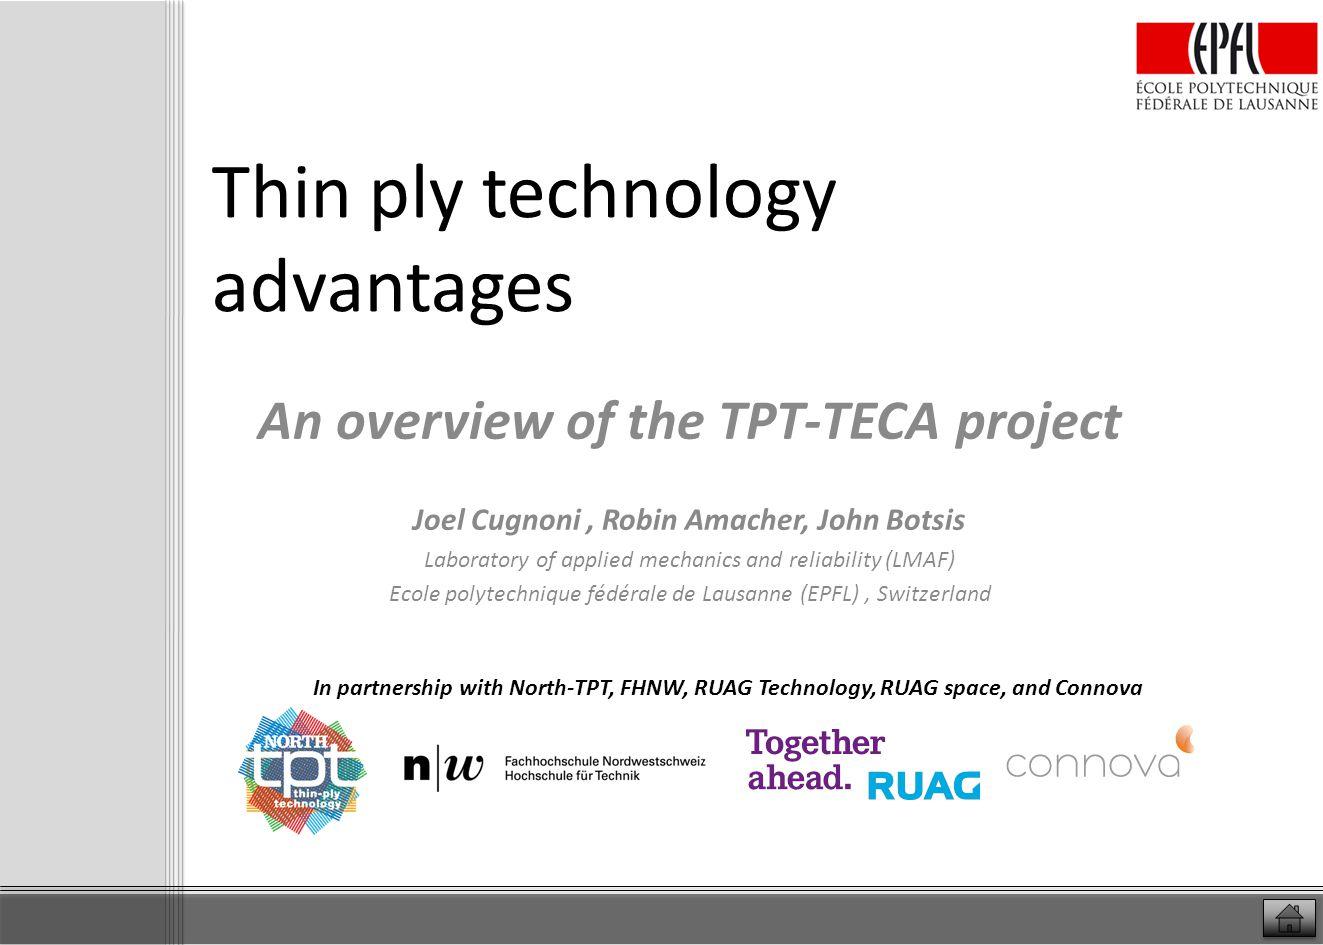 Thin ply technology advantages An overview of the TPT-TECA project Joel Cugnoni, Robin Amacher, John Botsis Laboratory of applied mechanics and reliab